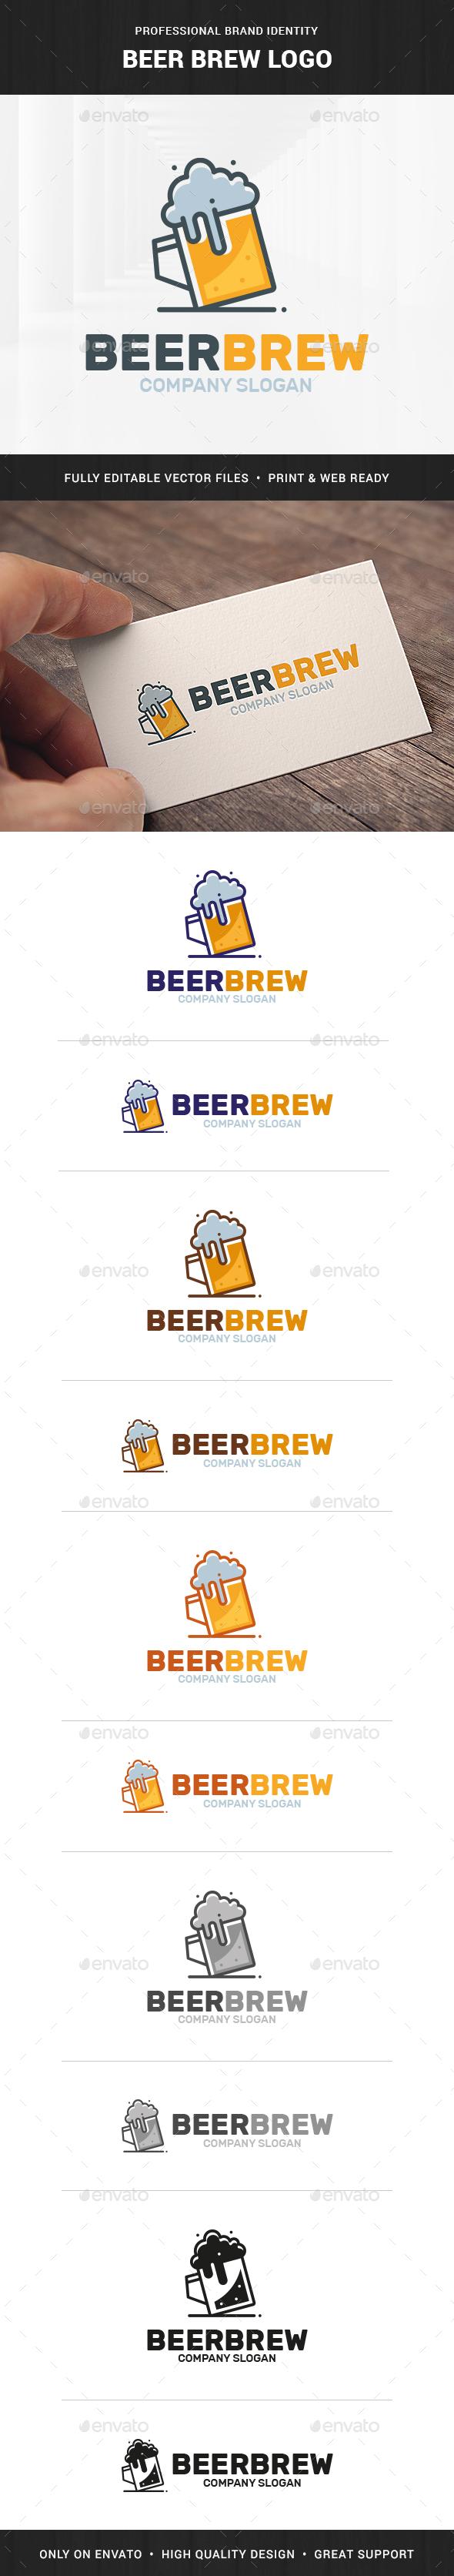 Beer Brew Logo Template